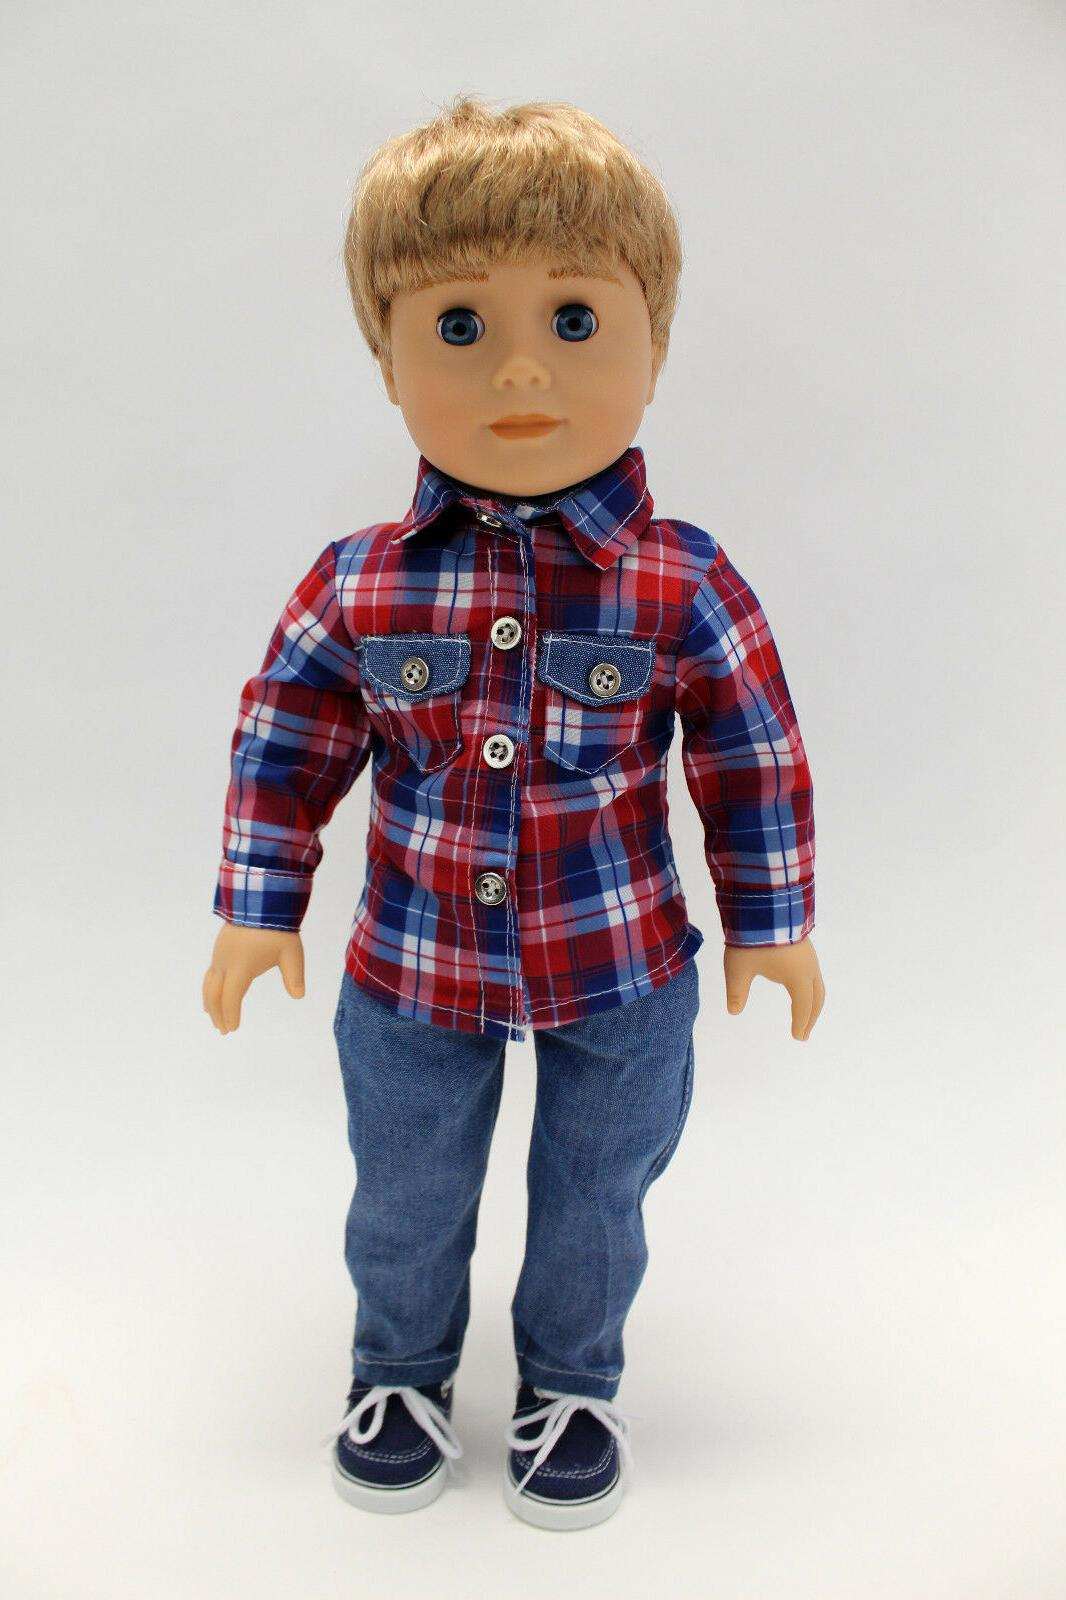 18 inch boy doll outfit plaid shirt